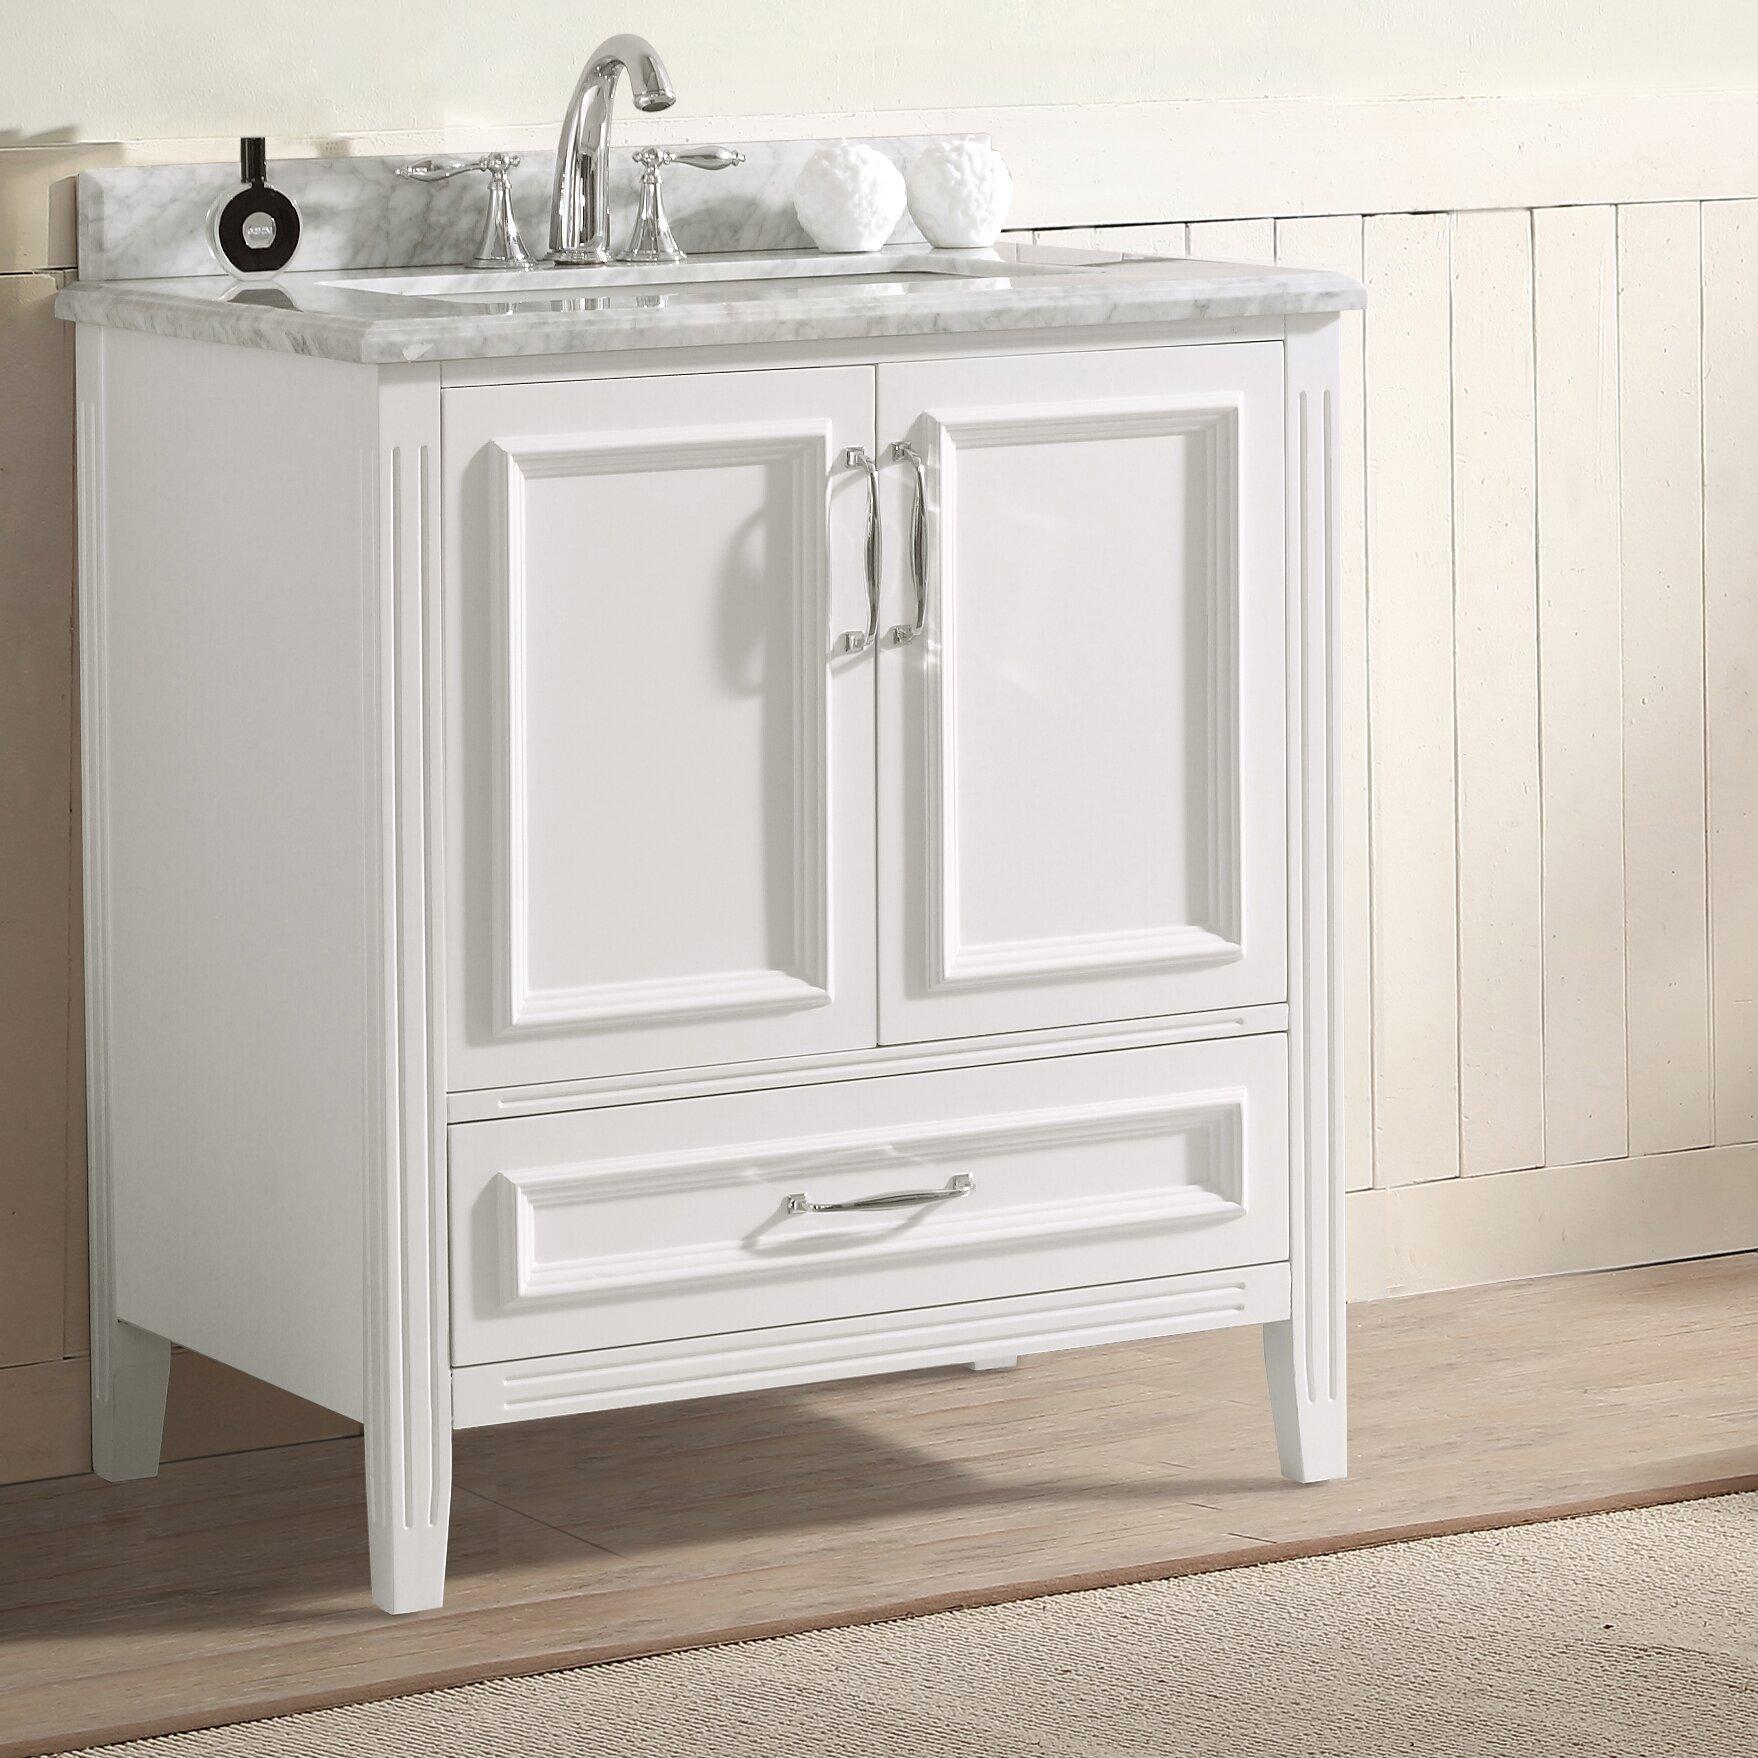 Ari Kitchen Bath Jude 30 Single Bathroom Vanity Set